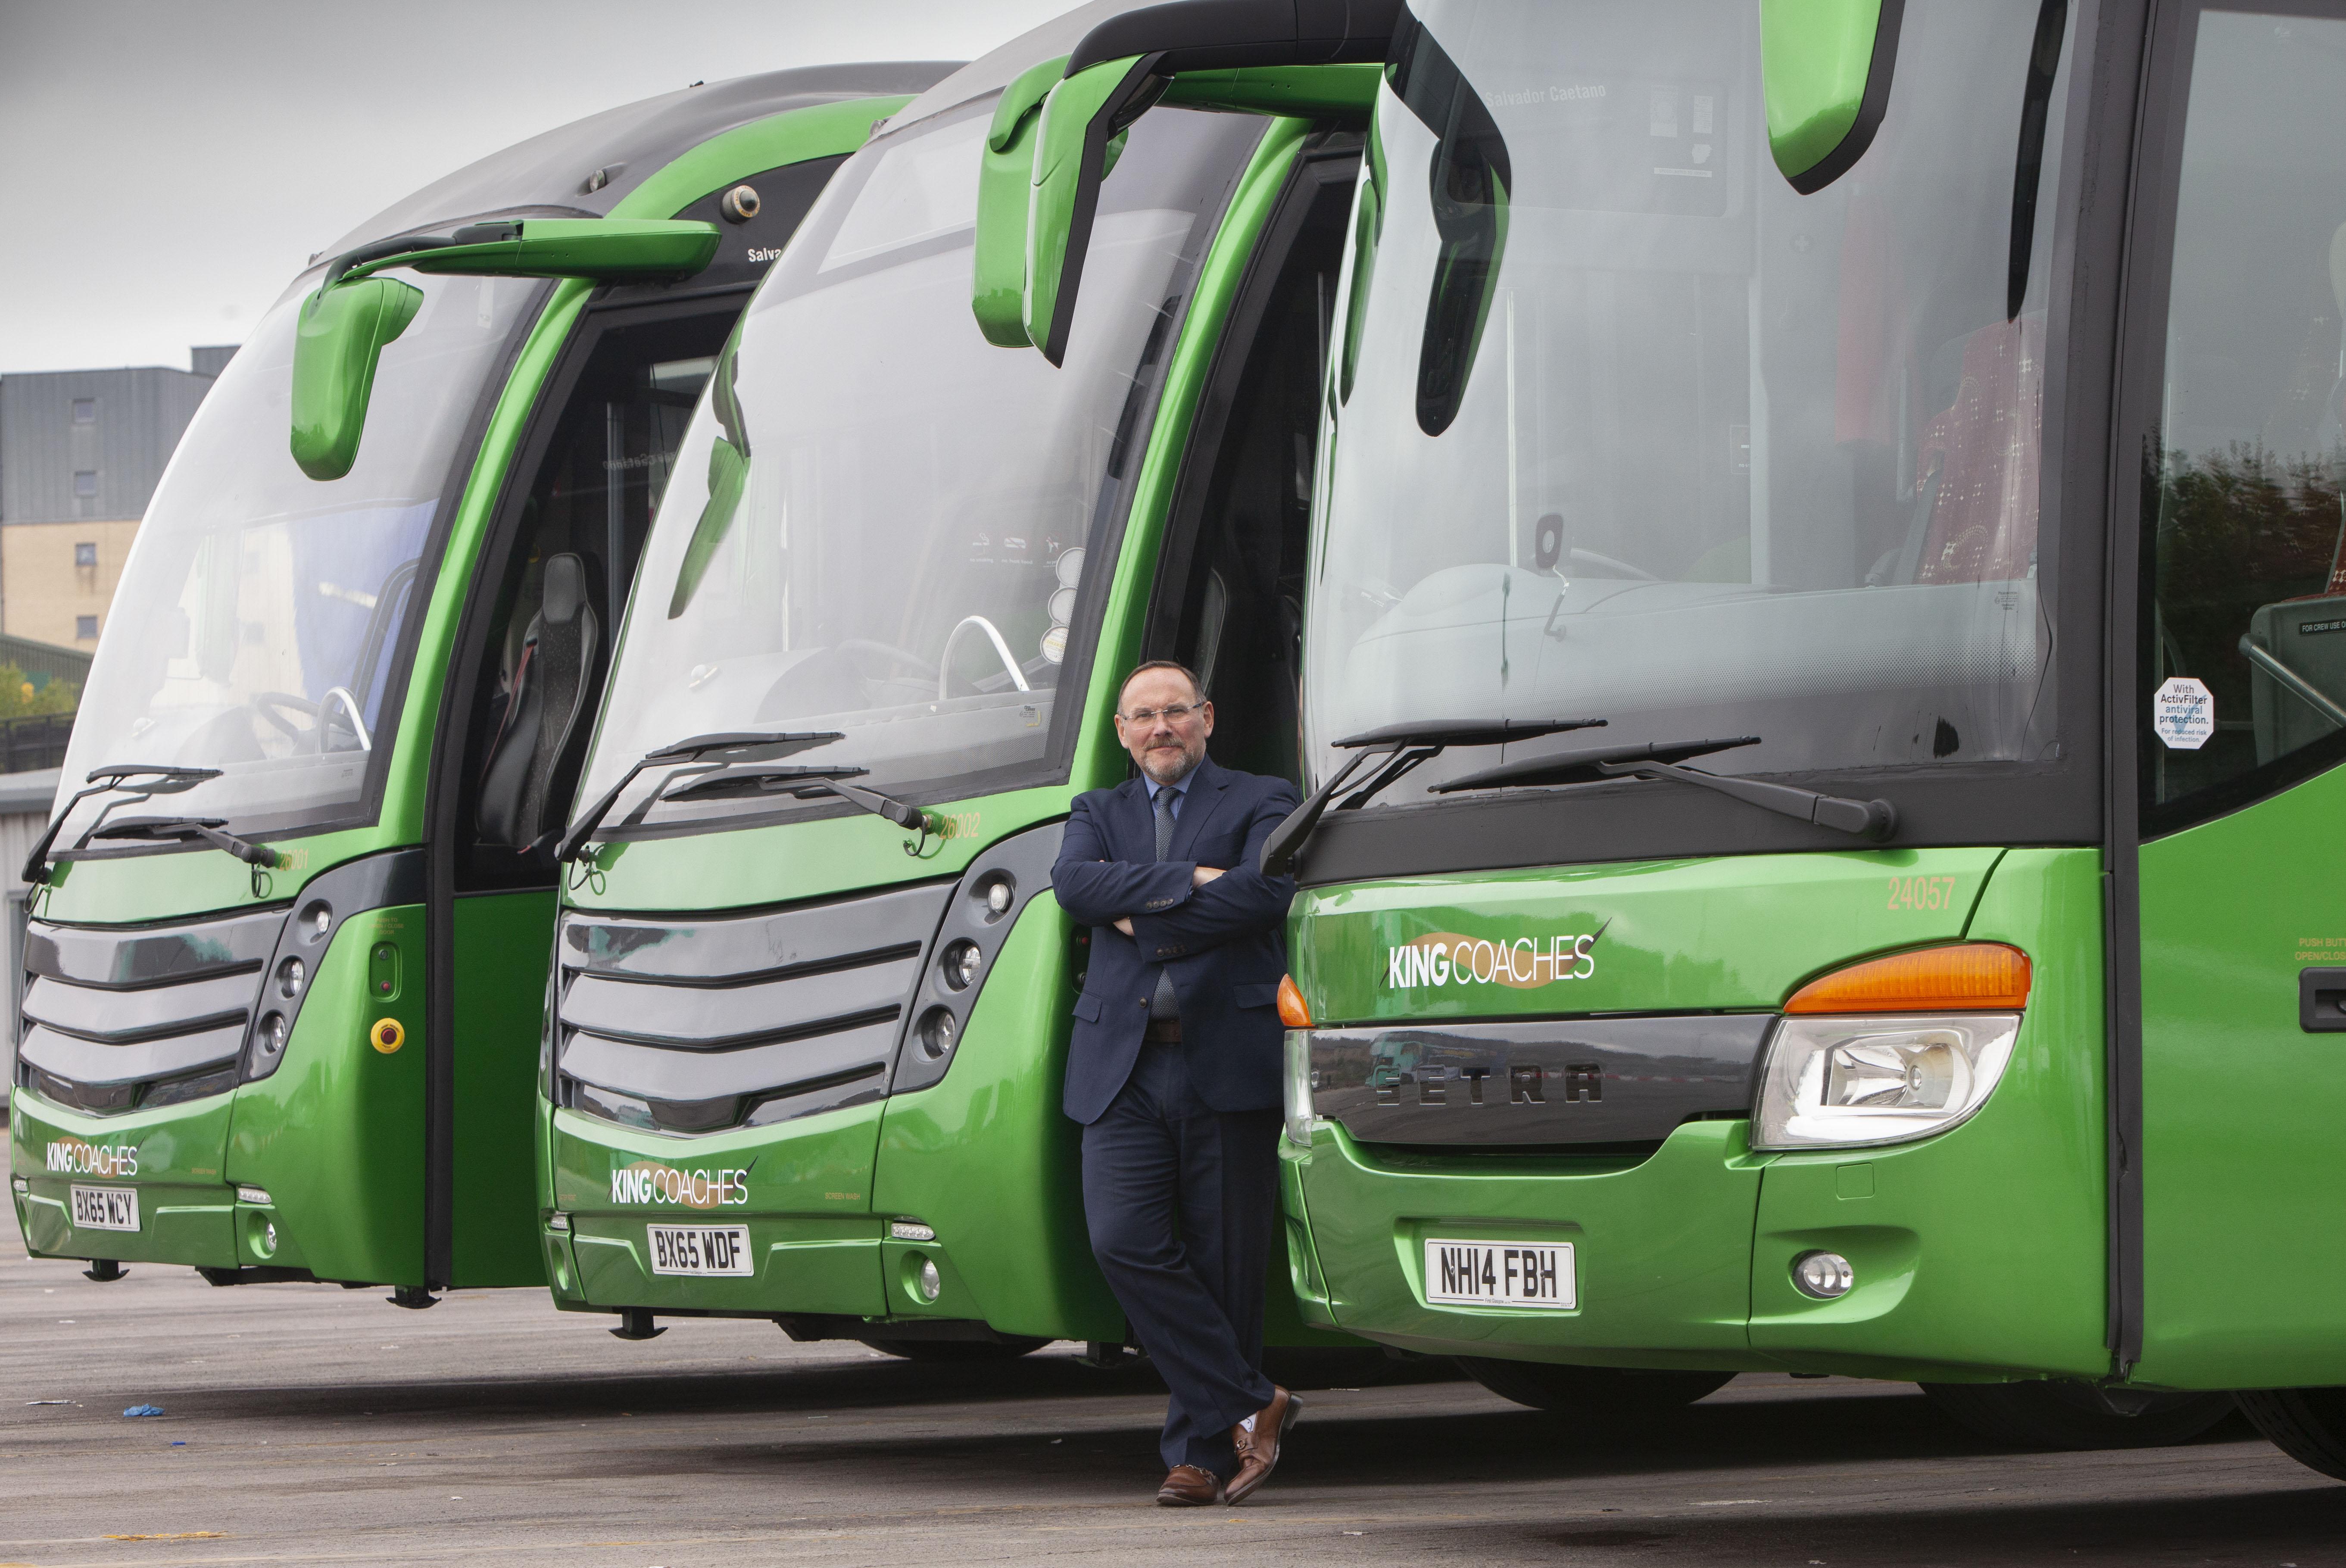 First starts new coaching brand in Aberdeen